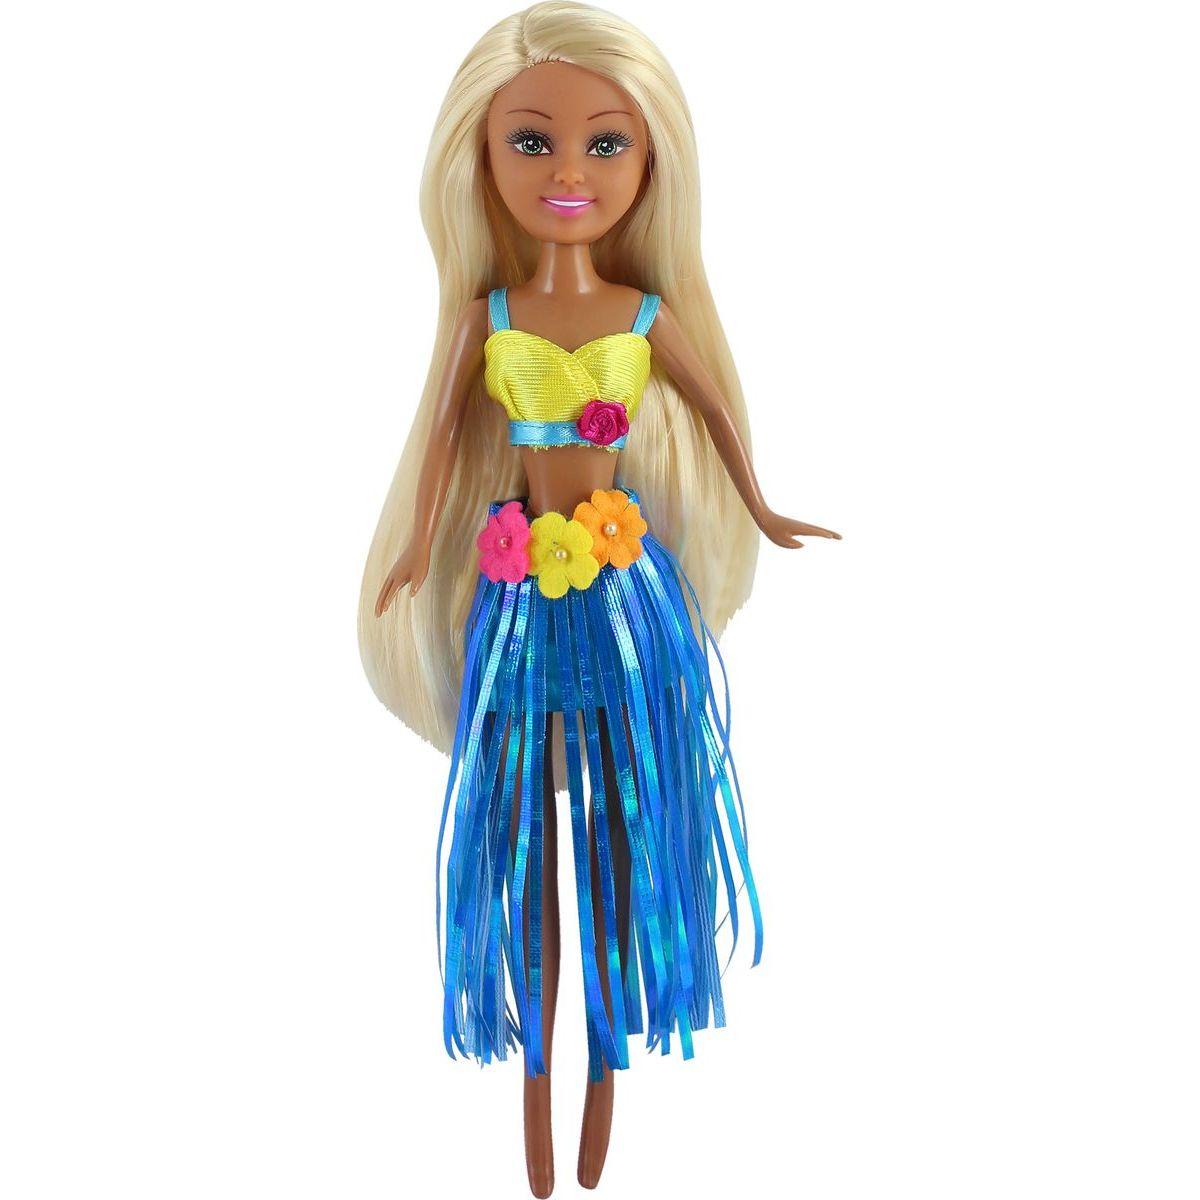 Funville Panenka z Oceanie Sparkle Girlz v kornoutu modrá sukně